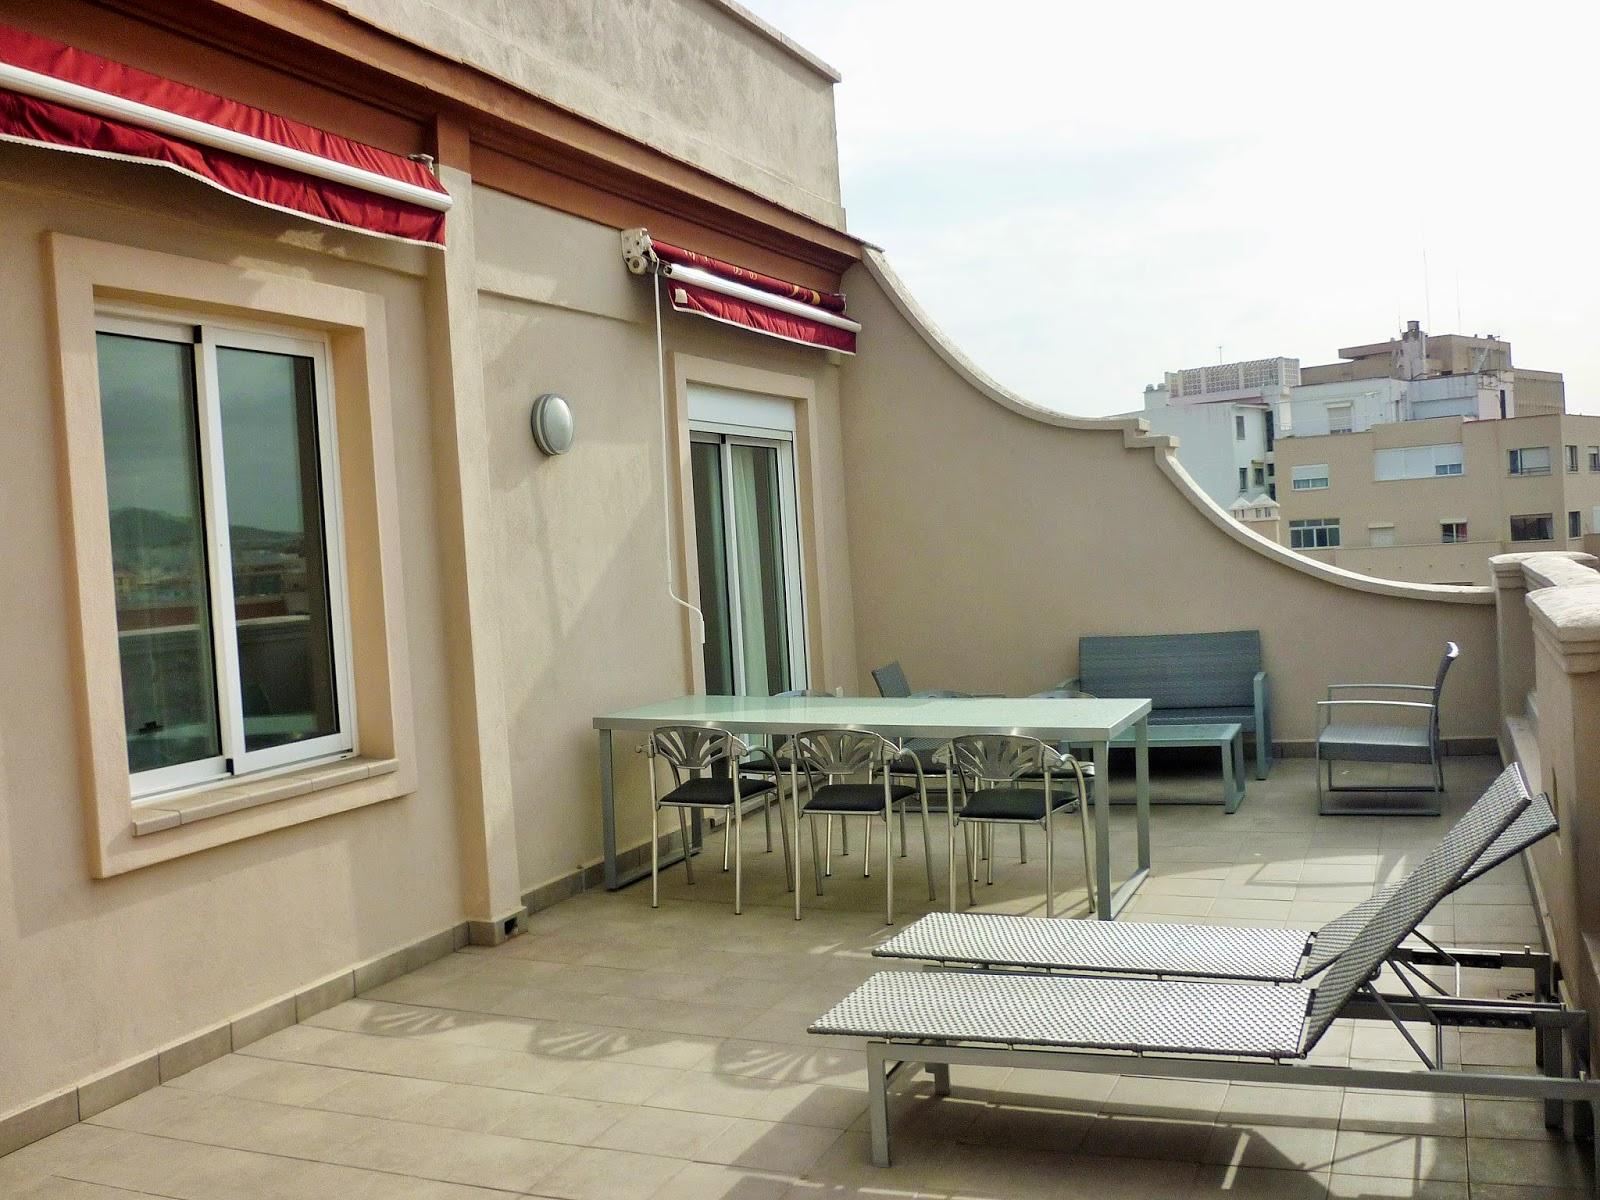 Malaga - Espagne - location - vacances - appartement - terrasse - centre-ville